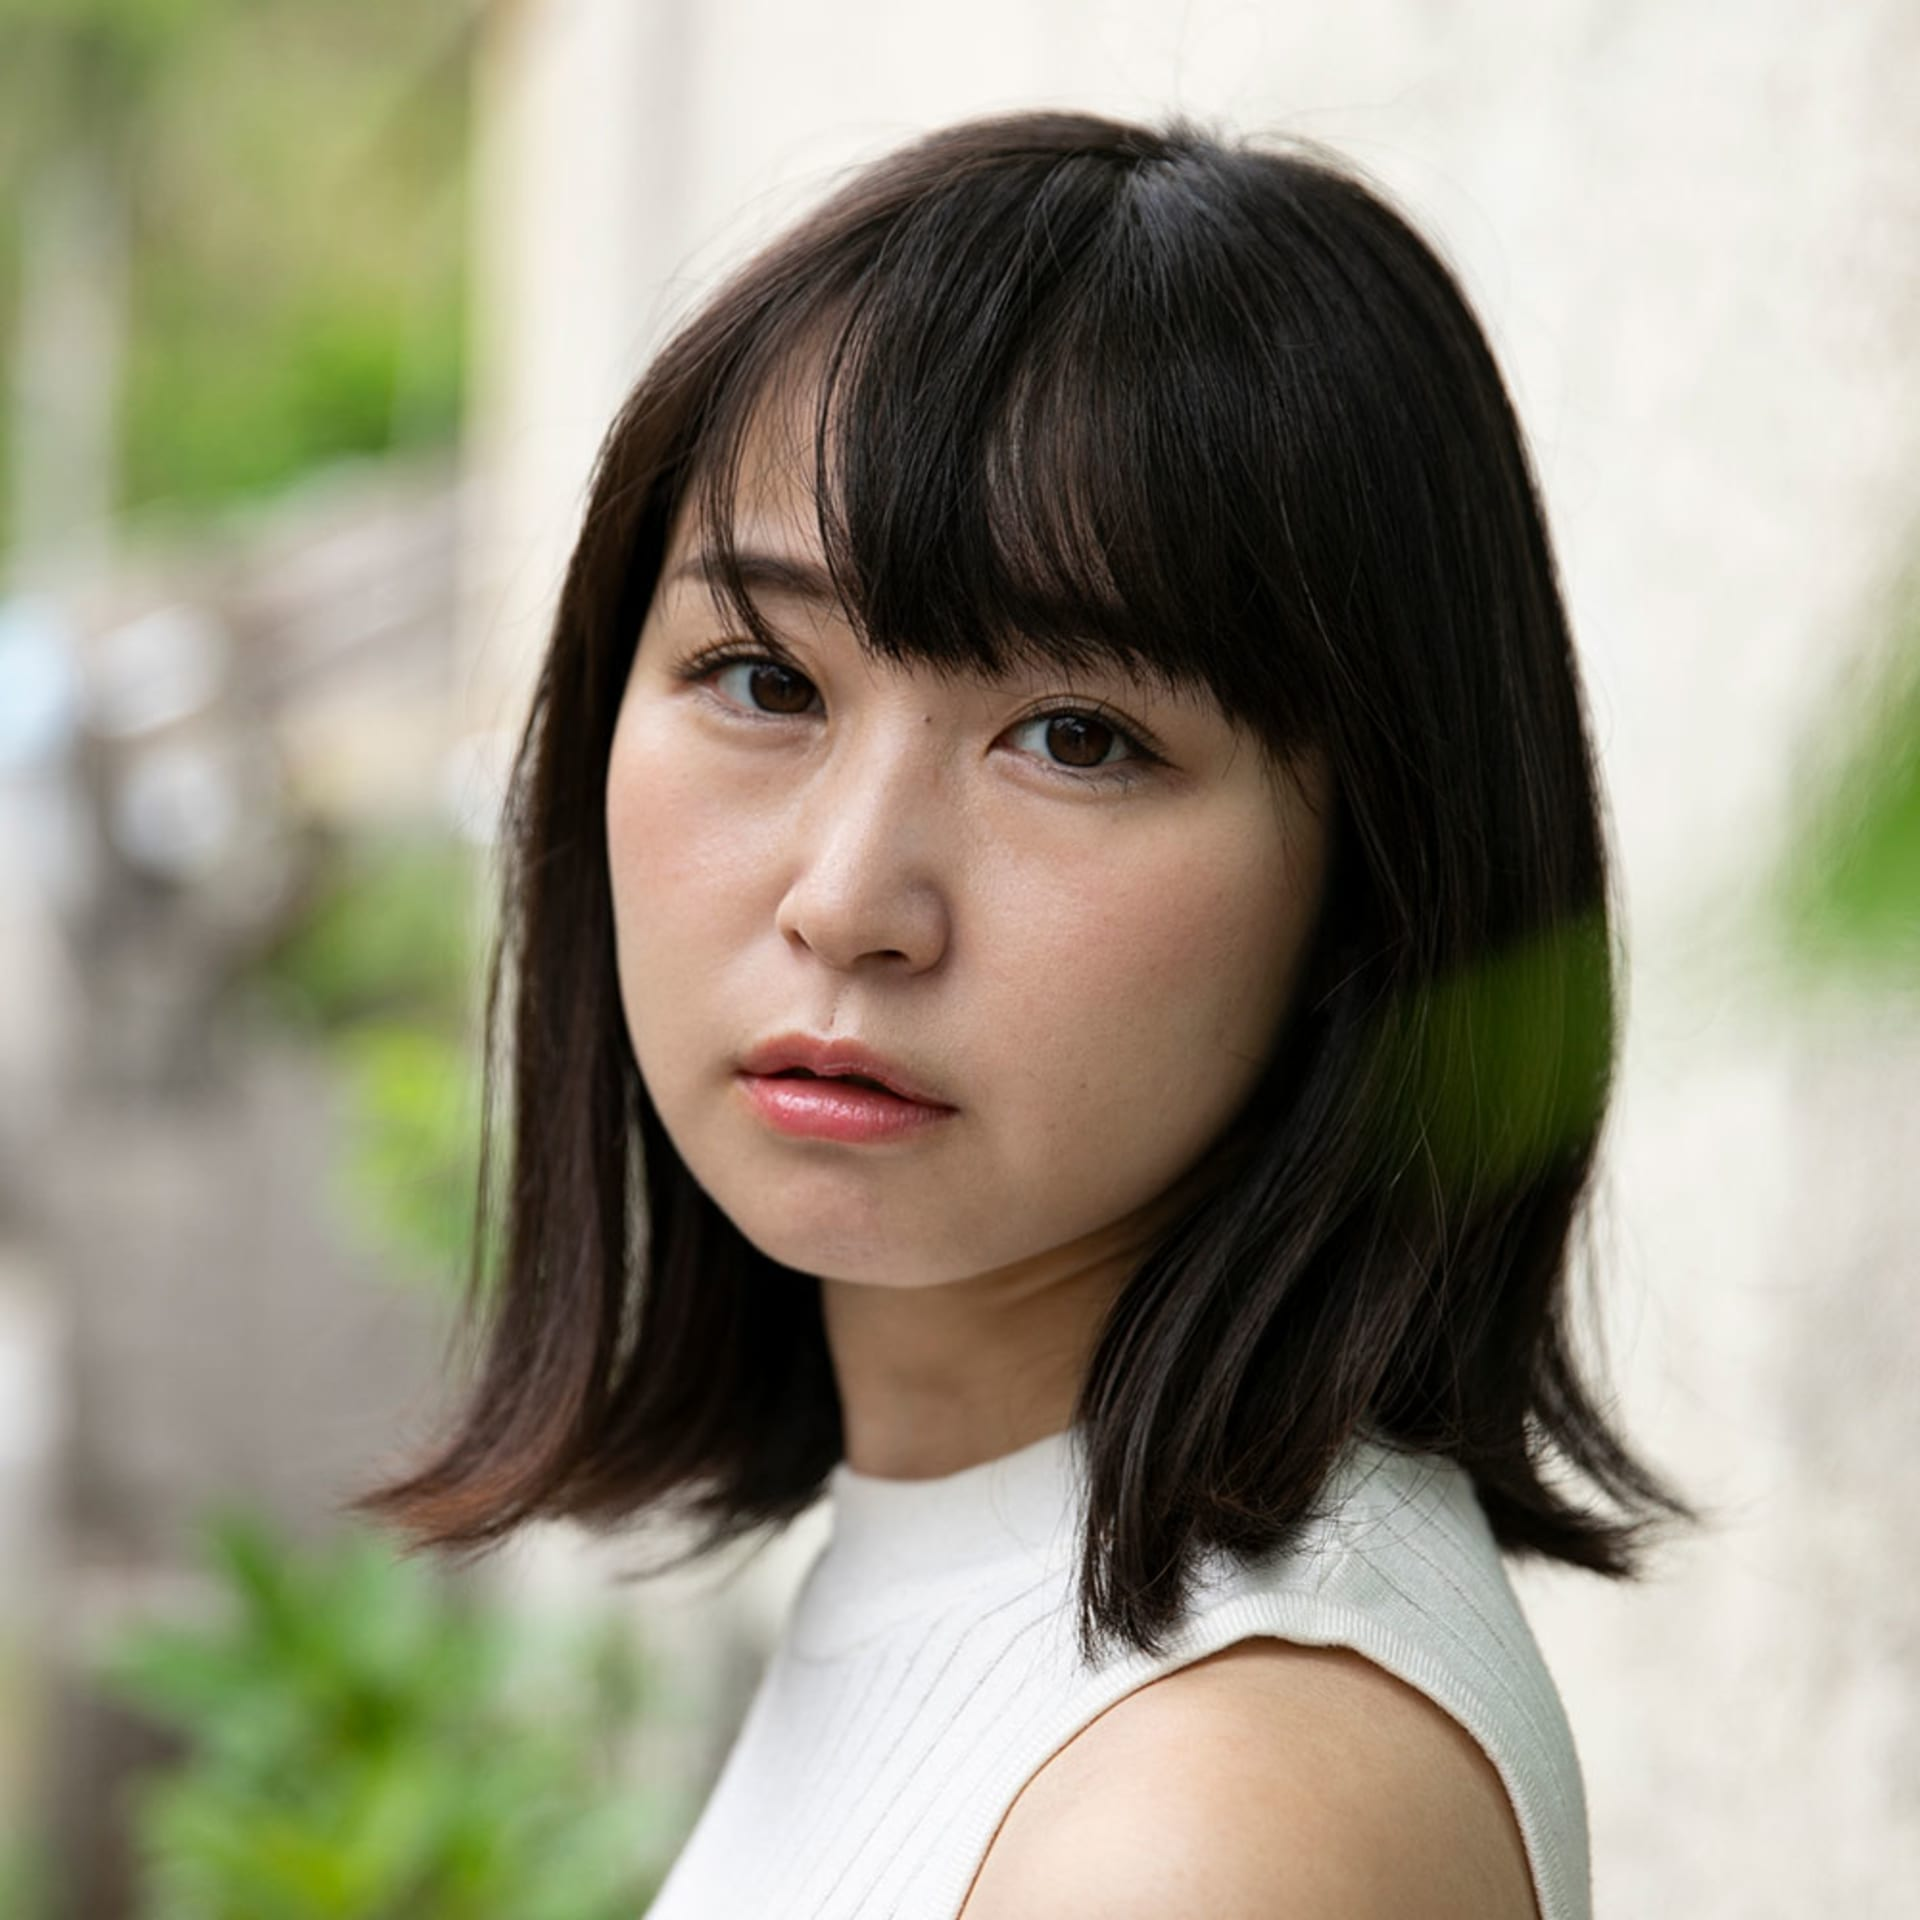 HERO 1 Yumi face credit Takuya Fukuzawa